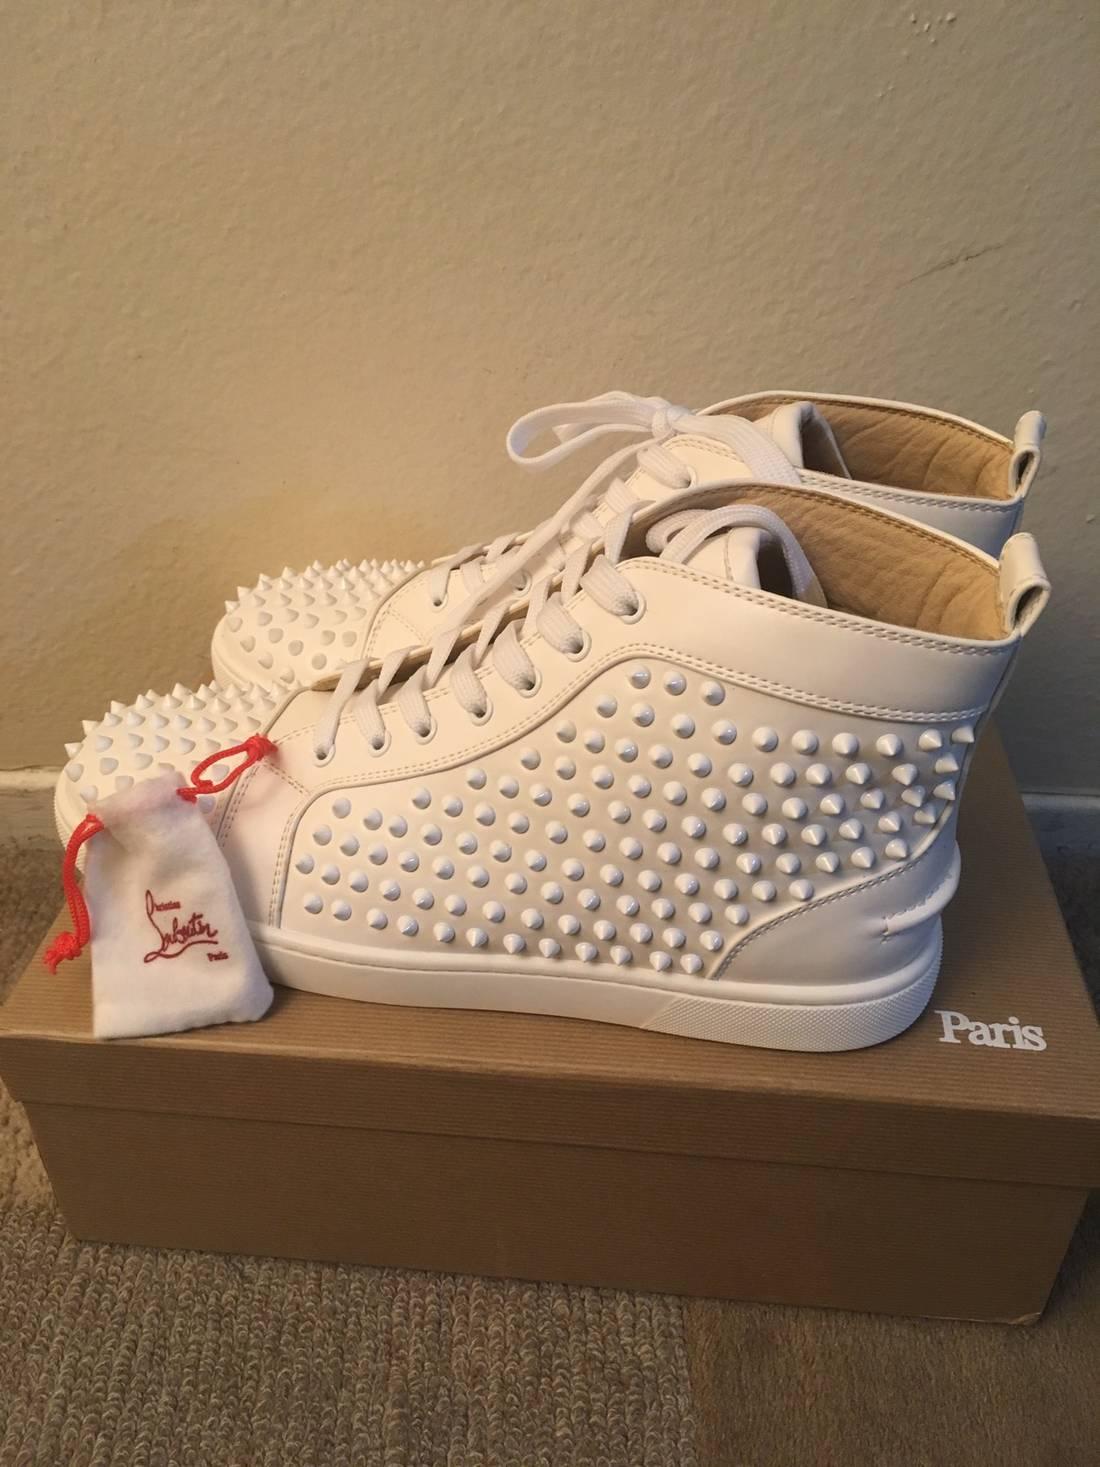 152e6d110f7 ... usa christian louboutin christian louboutin white spiked mens shoes  size us 12 eu 76685 02022